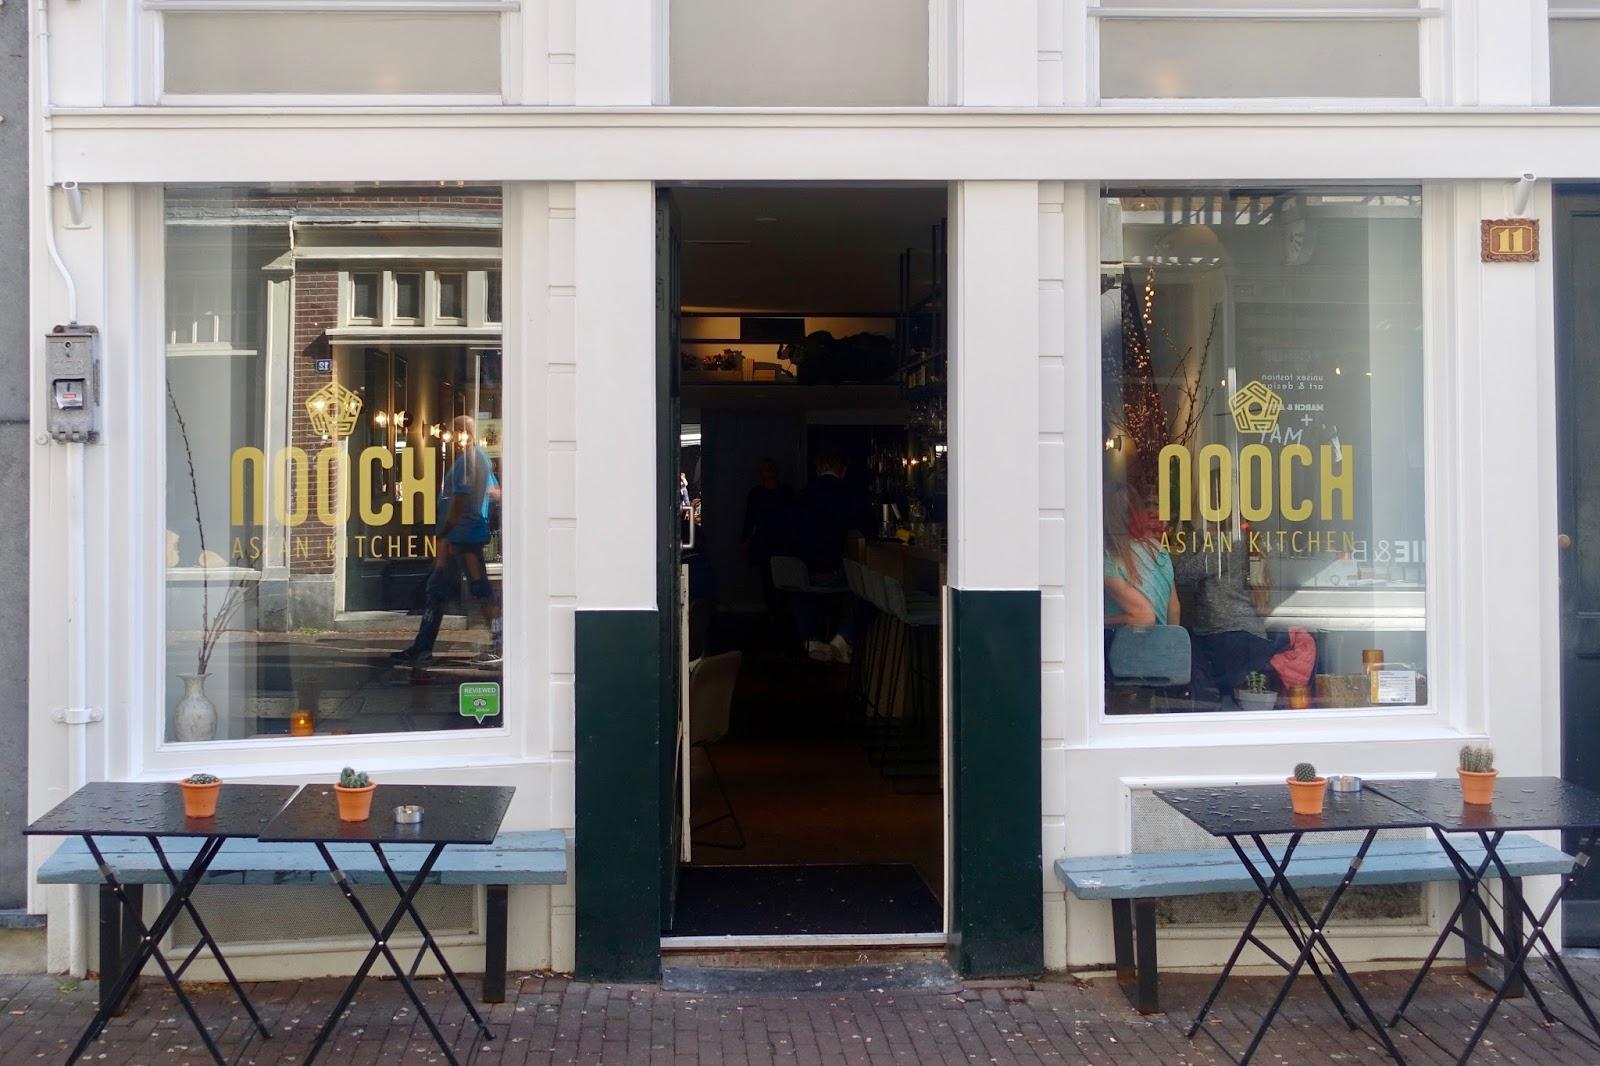 Nooch Amsterdam